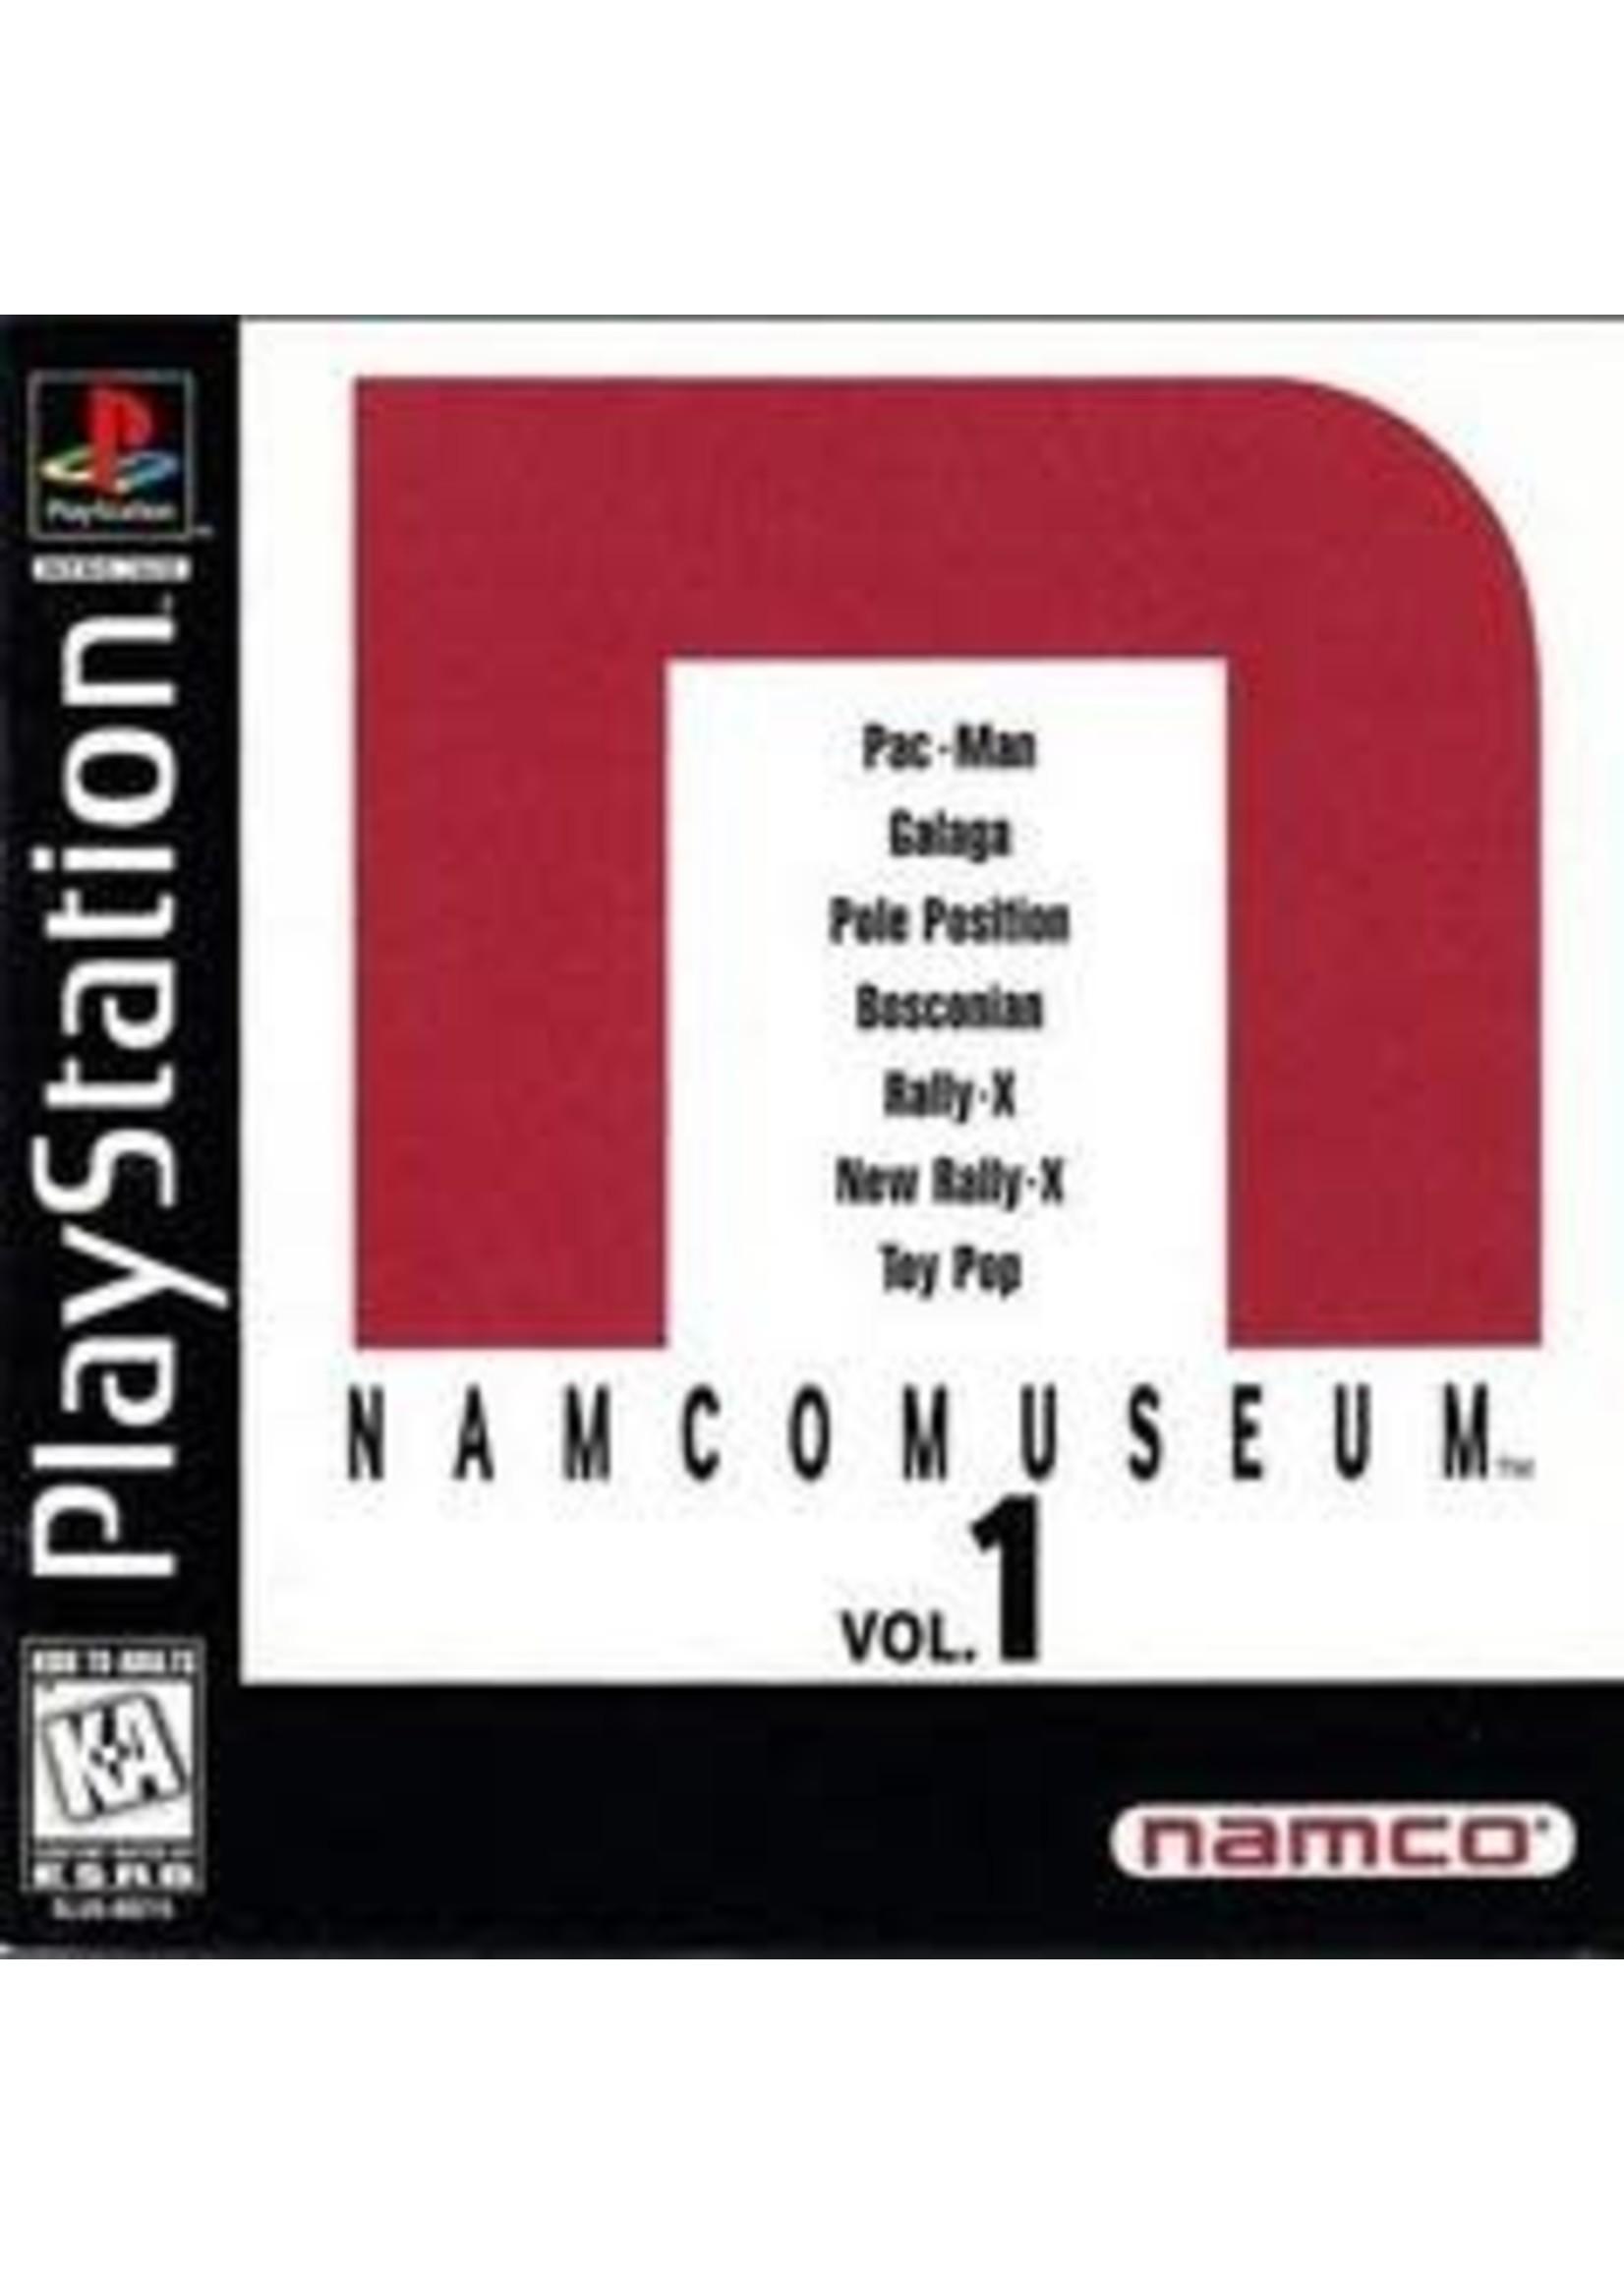 Namco Museum Volume 1 Playstation